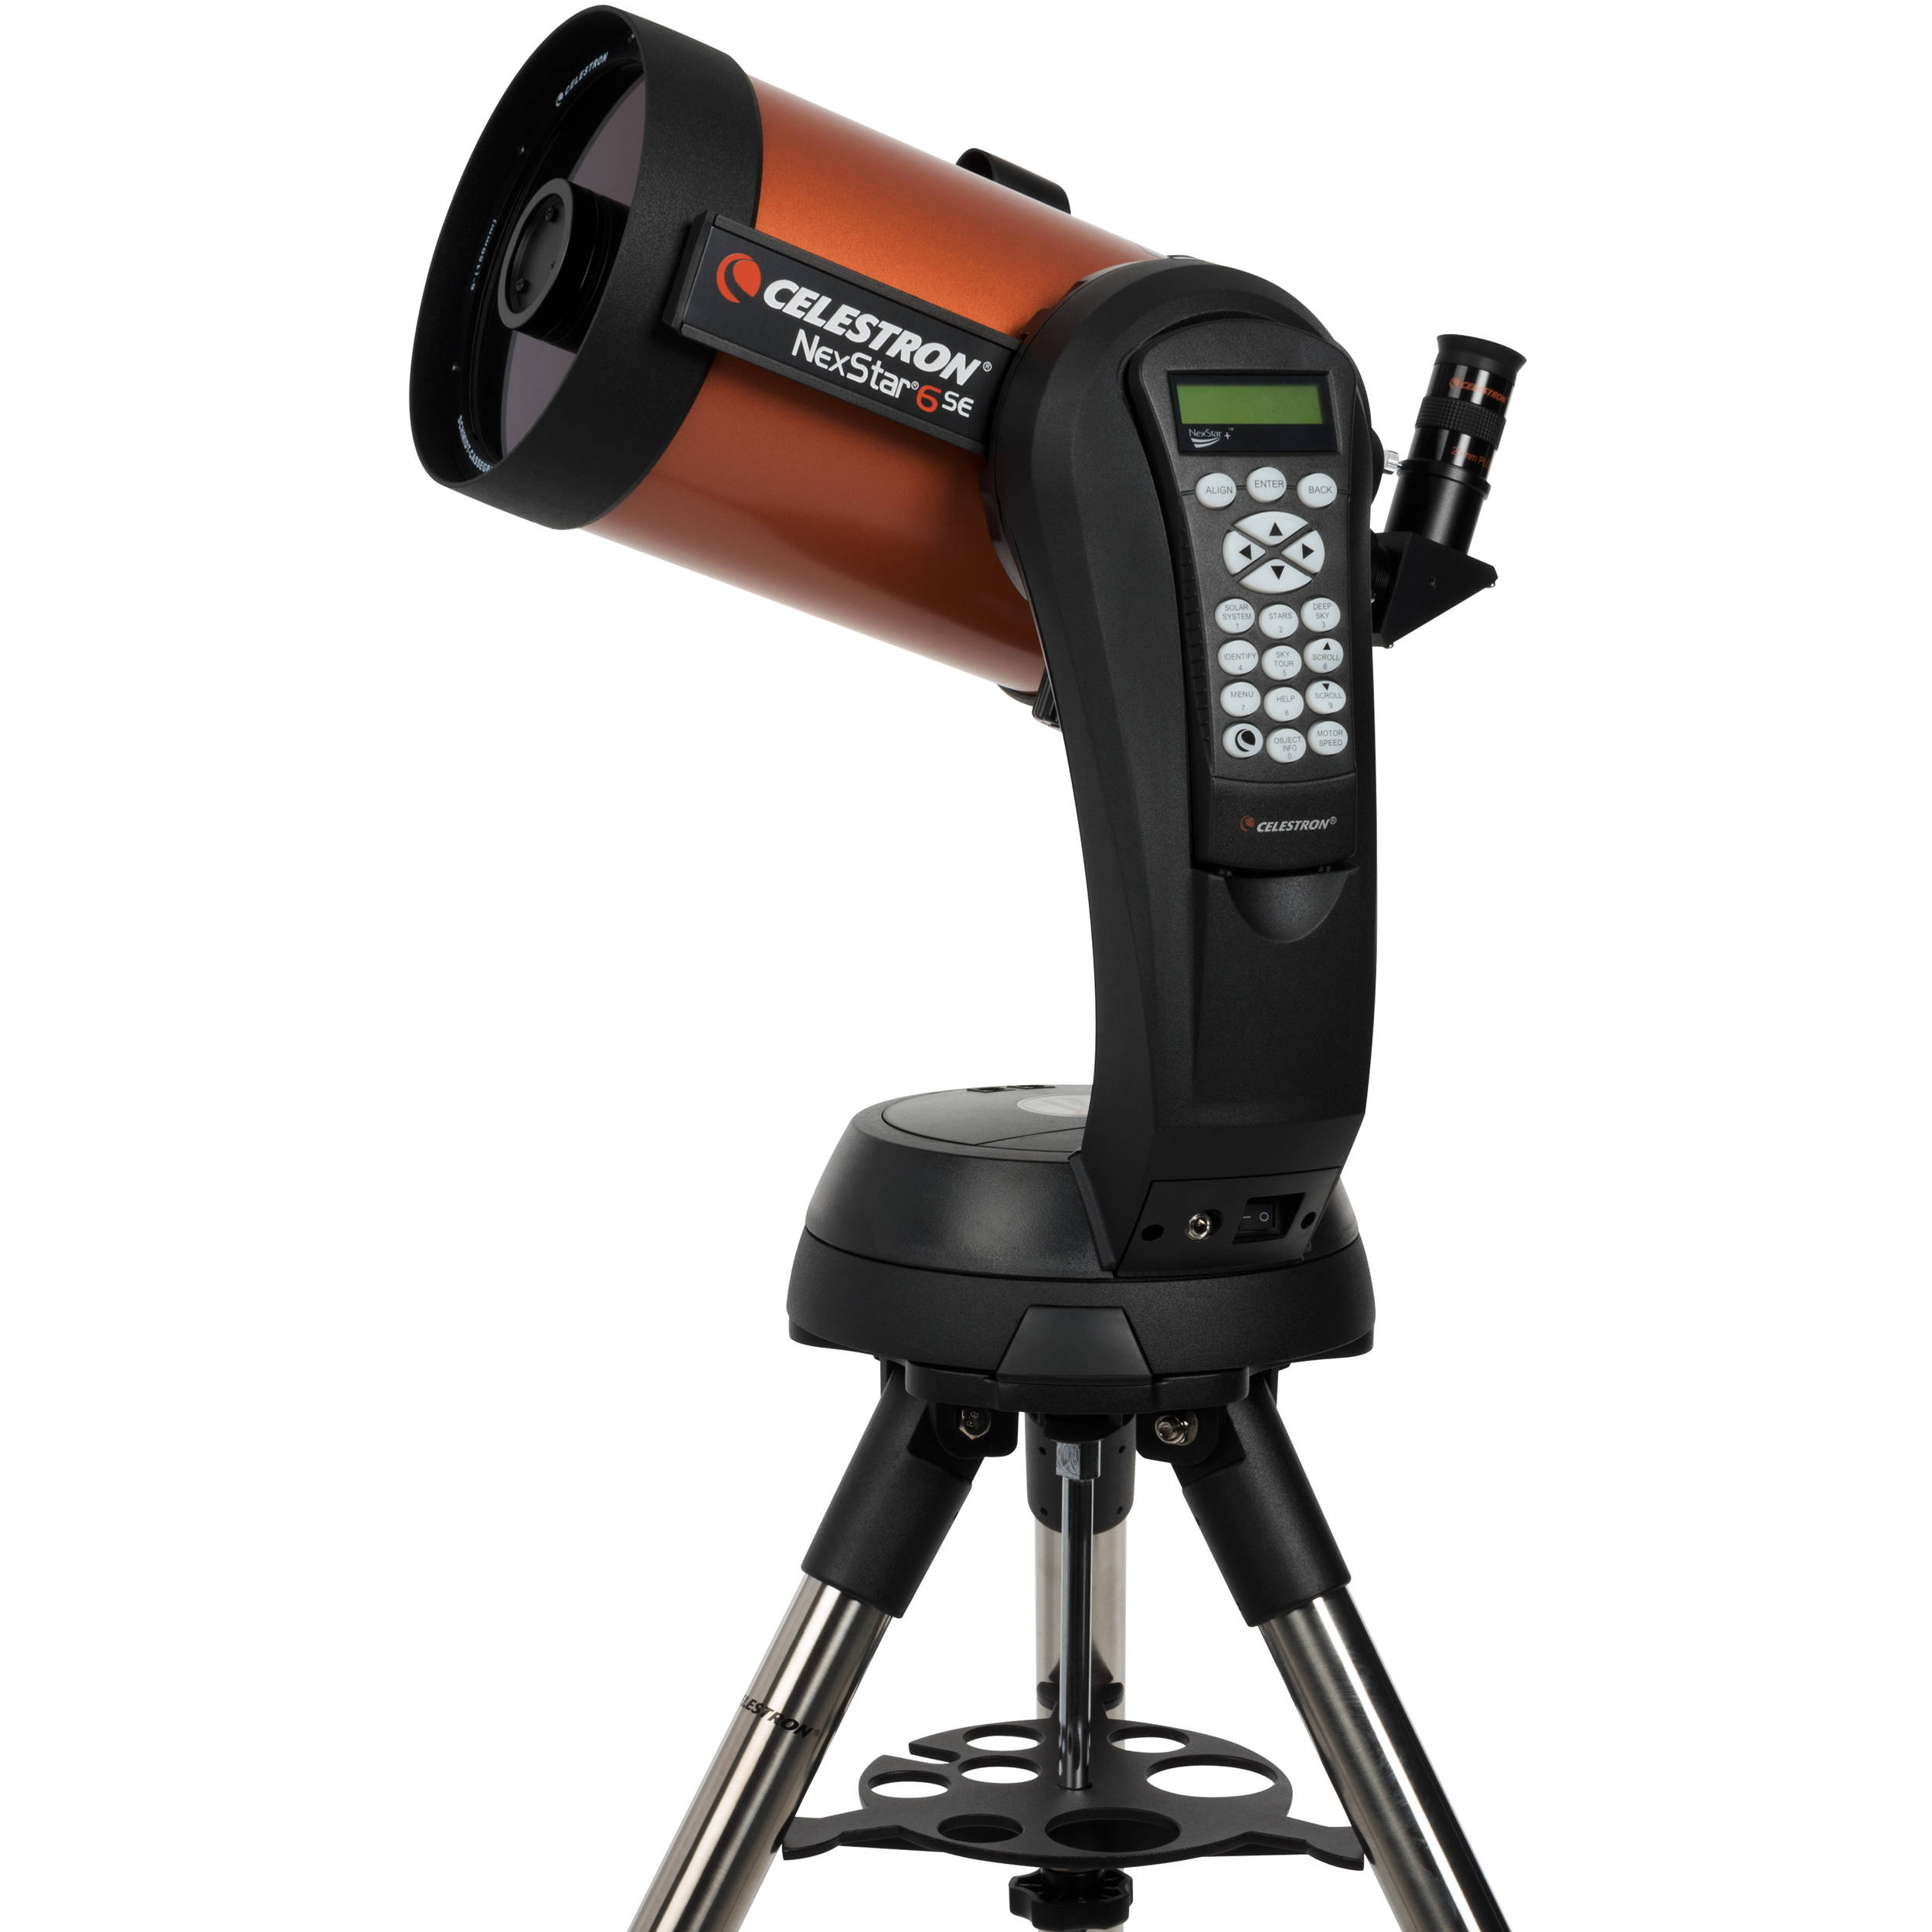 celestron nexstar 6se telescope review